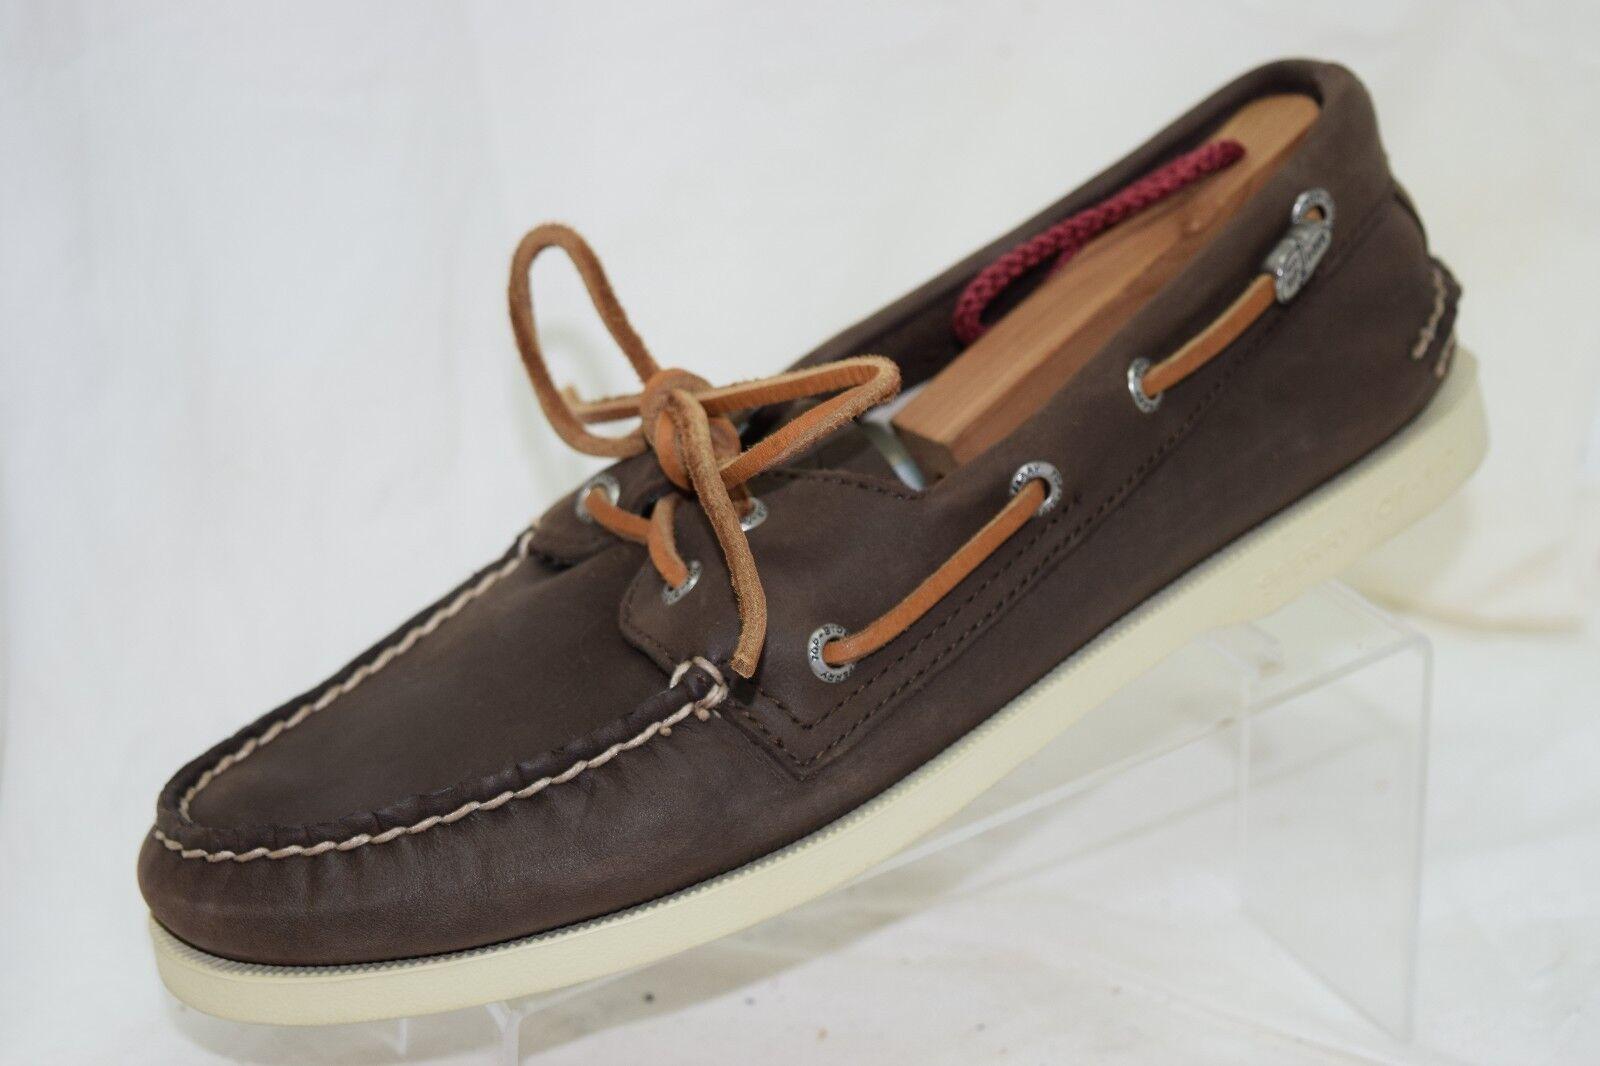 Sperry Top Sider Brown Leather Original Boat shoes Loafer Moc Toe EUC Men's 8 M